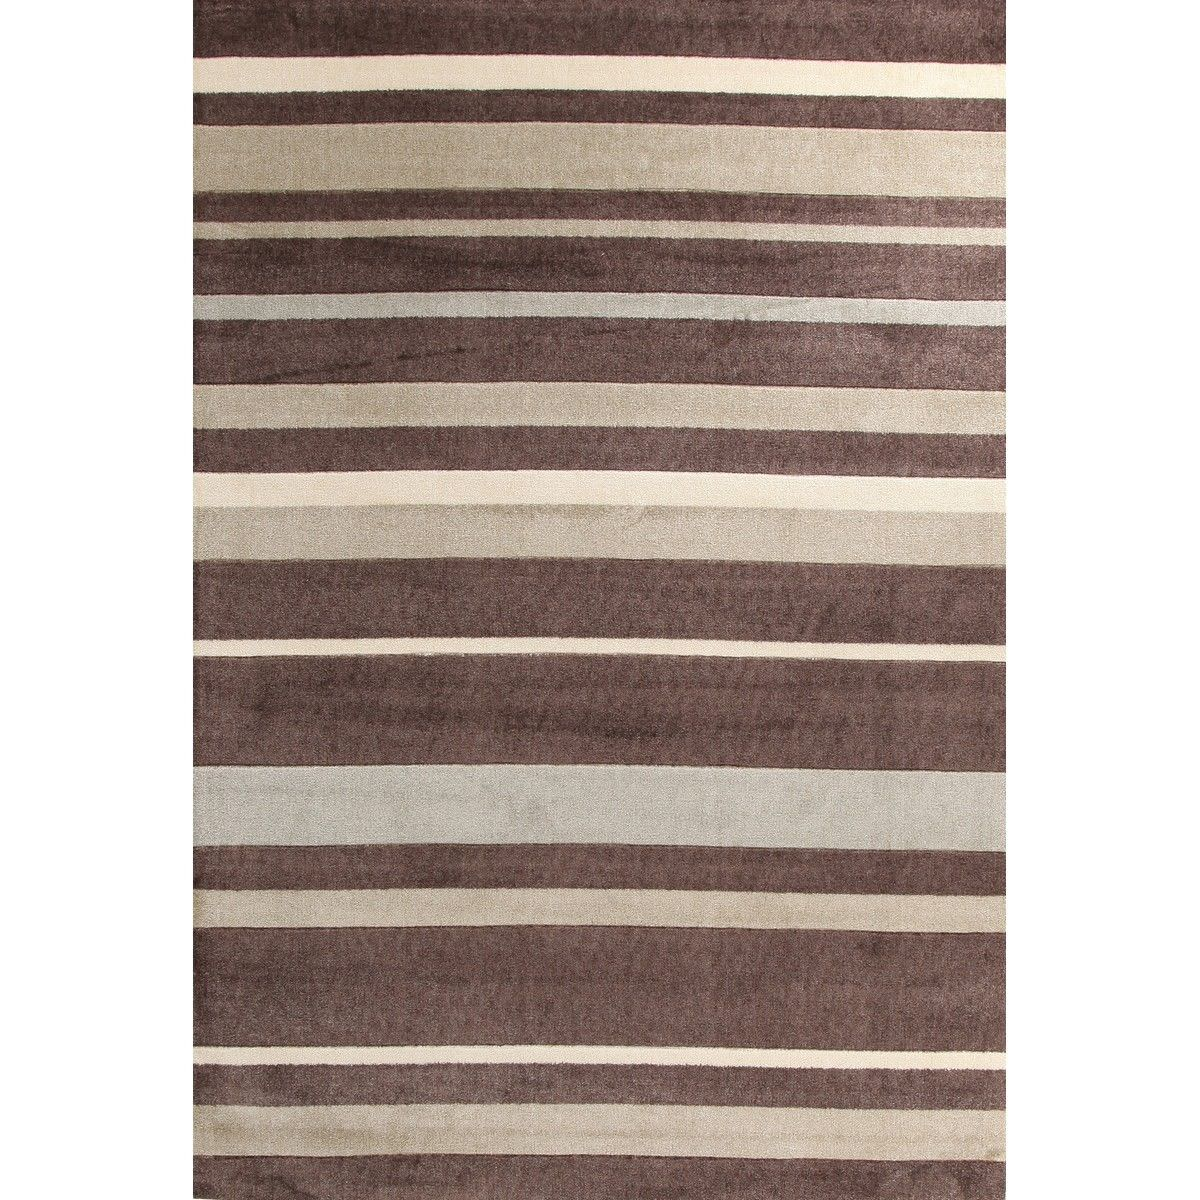 City Stylish Stripe Modern Rug, Beige 220x150cm, Brown / Taupe